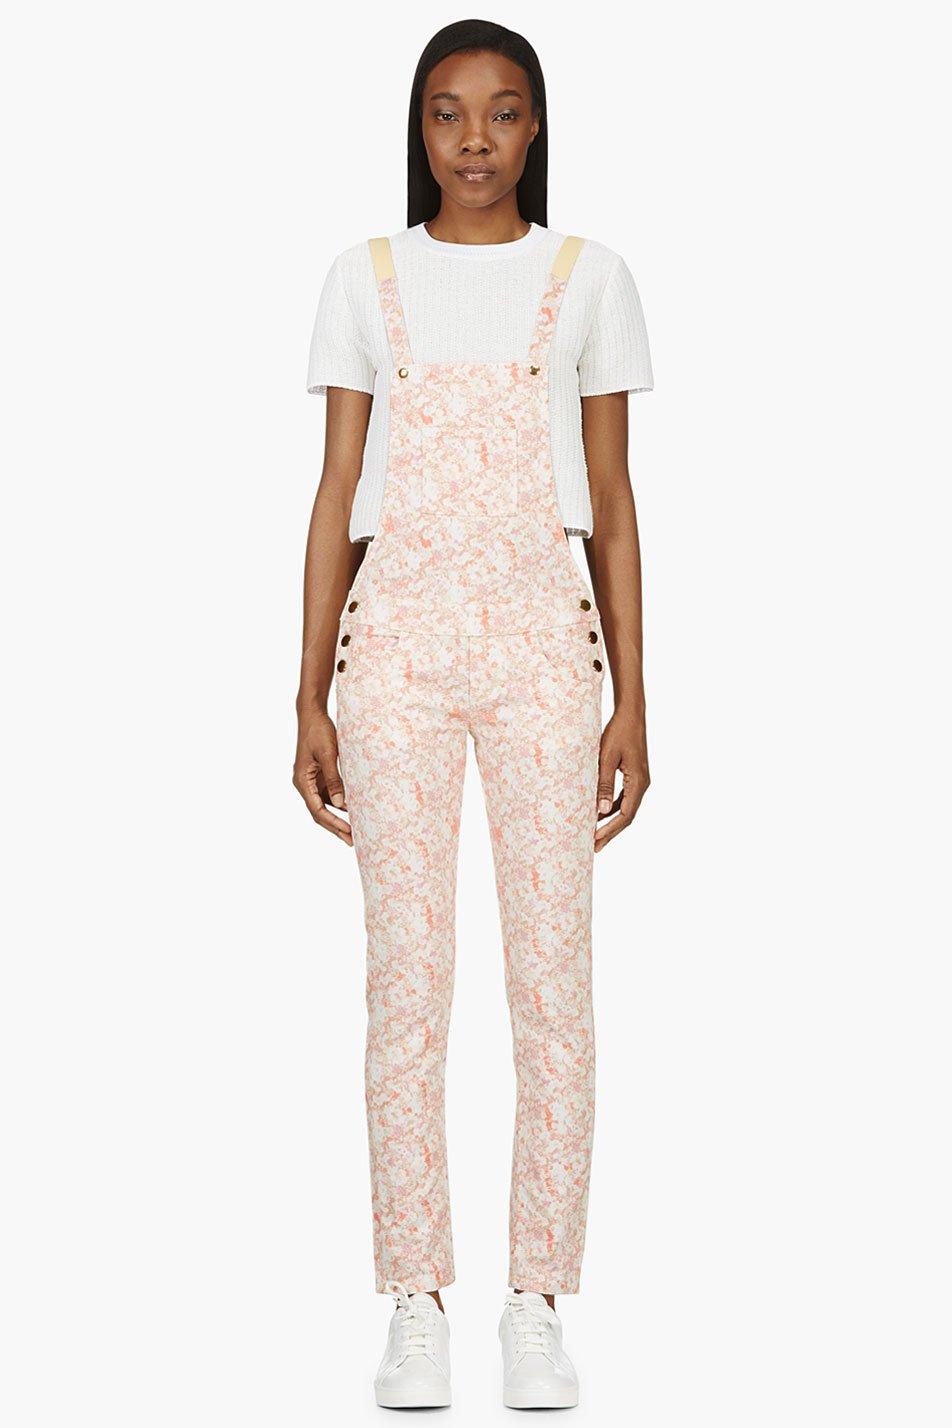 roseanna peach floral overalls